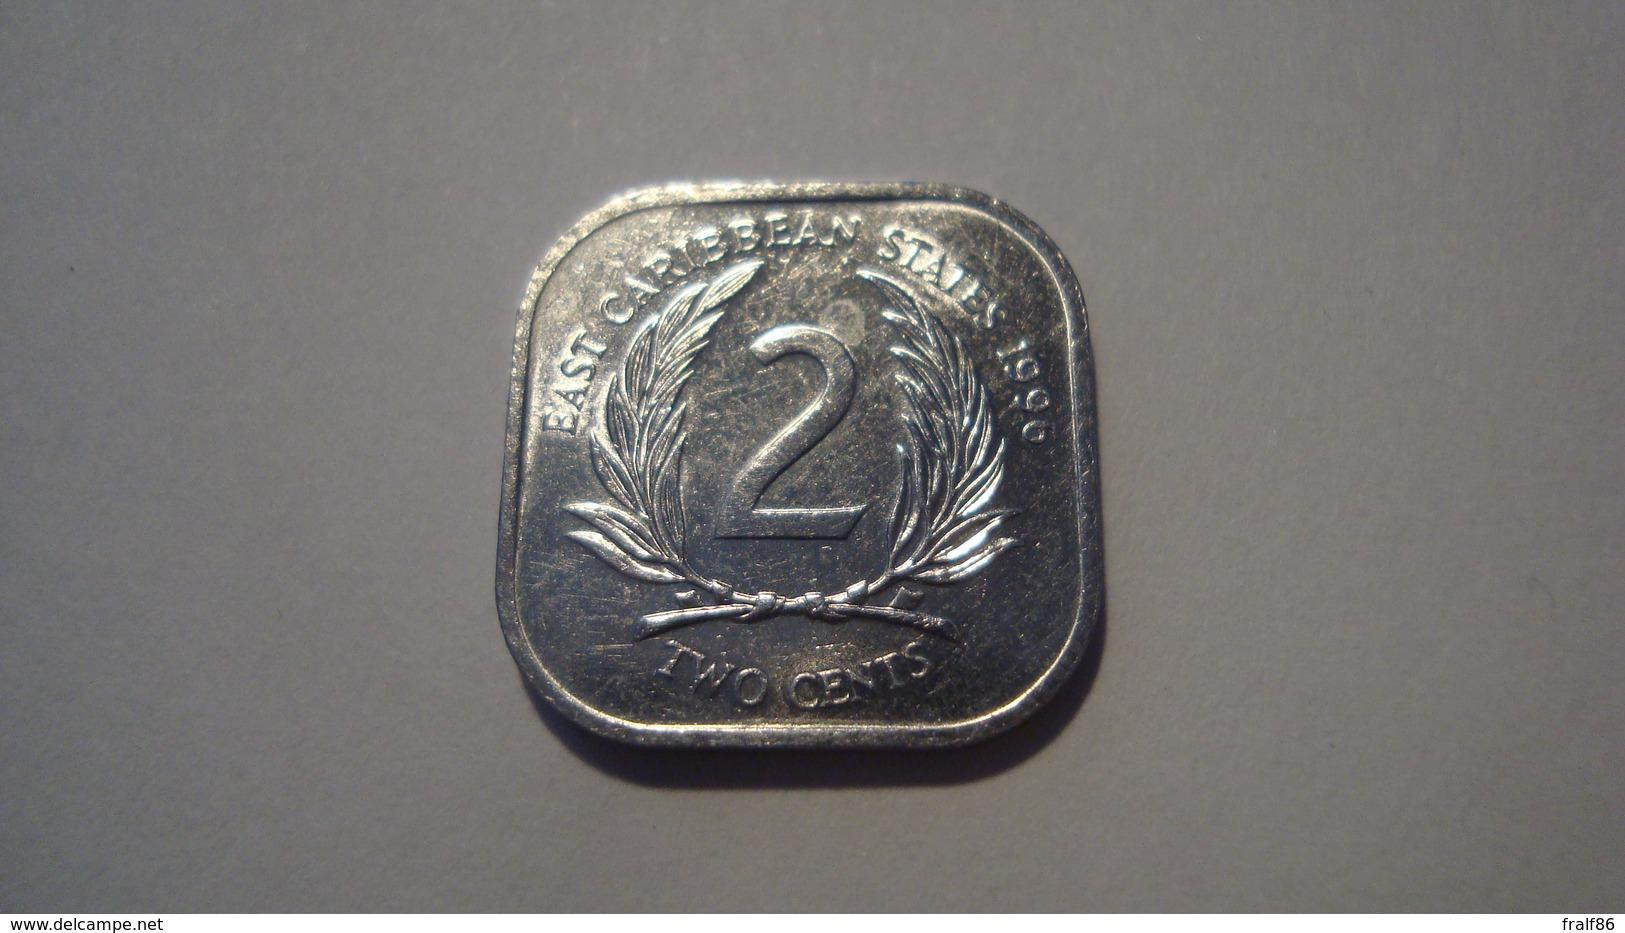 MONNAIE CARAIBES ORIENTALES 2 CENTS 1996 - Caribe Oriental (Estados Del)